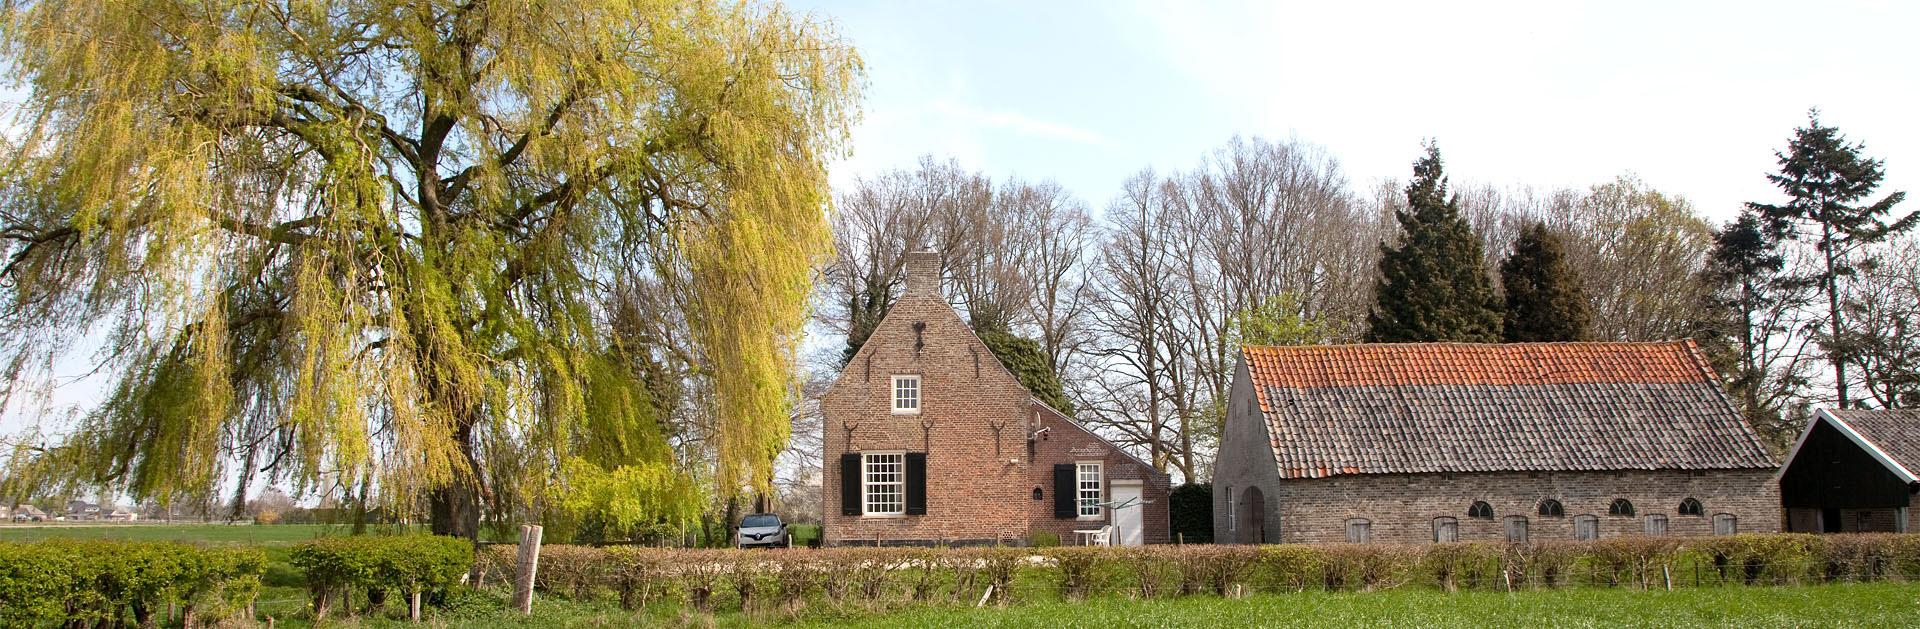 Havezate Luynhorst - Greffelkamp